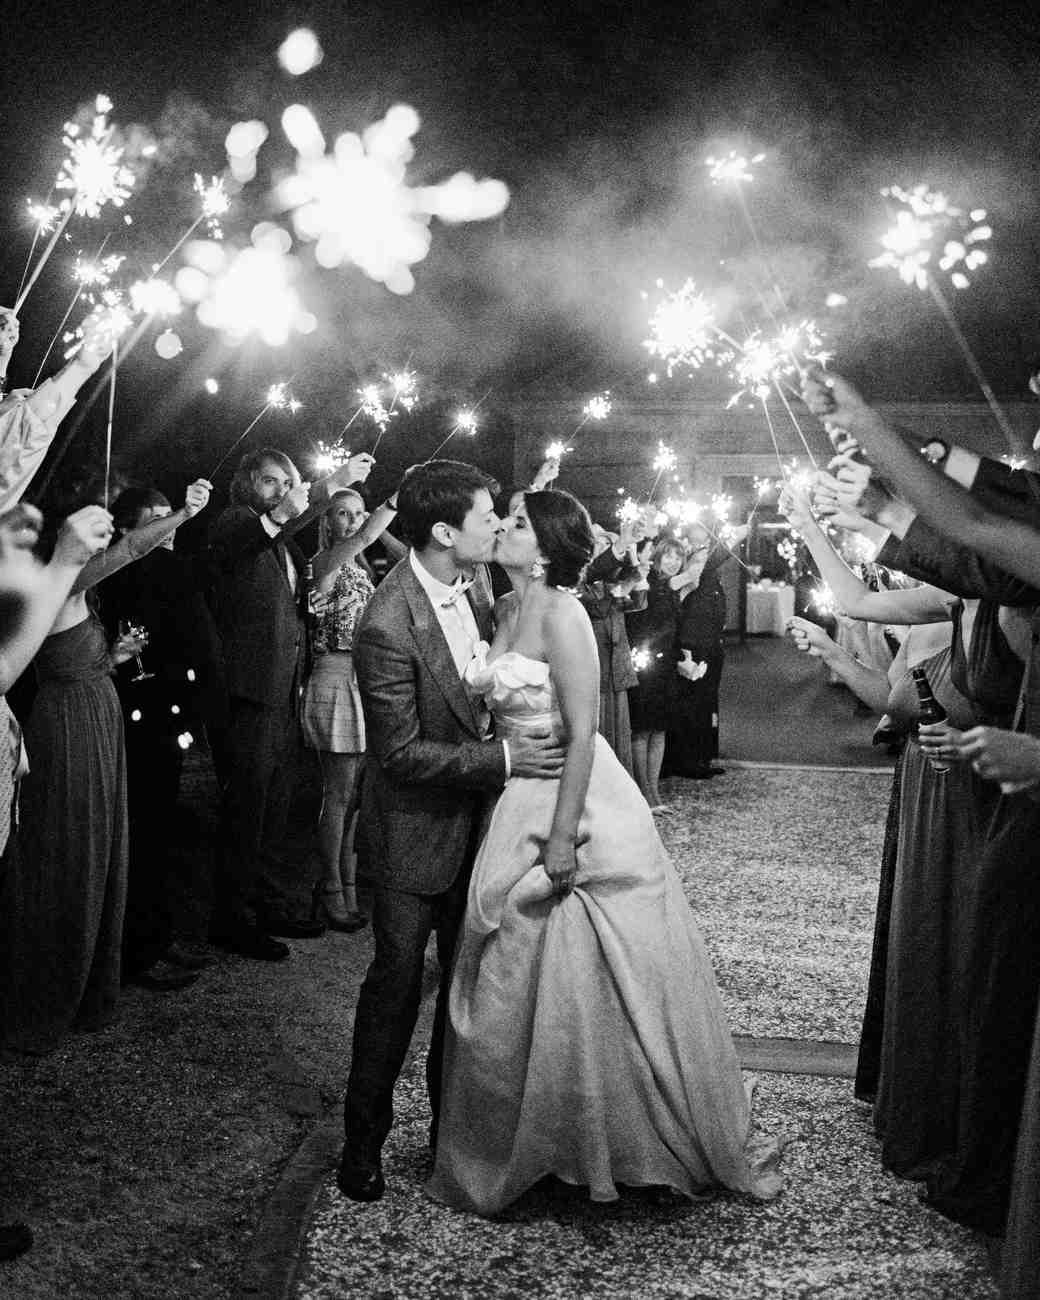 catherine-adrien-wedding-sparklers-1014-s111414-0814.jpg